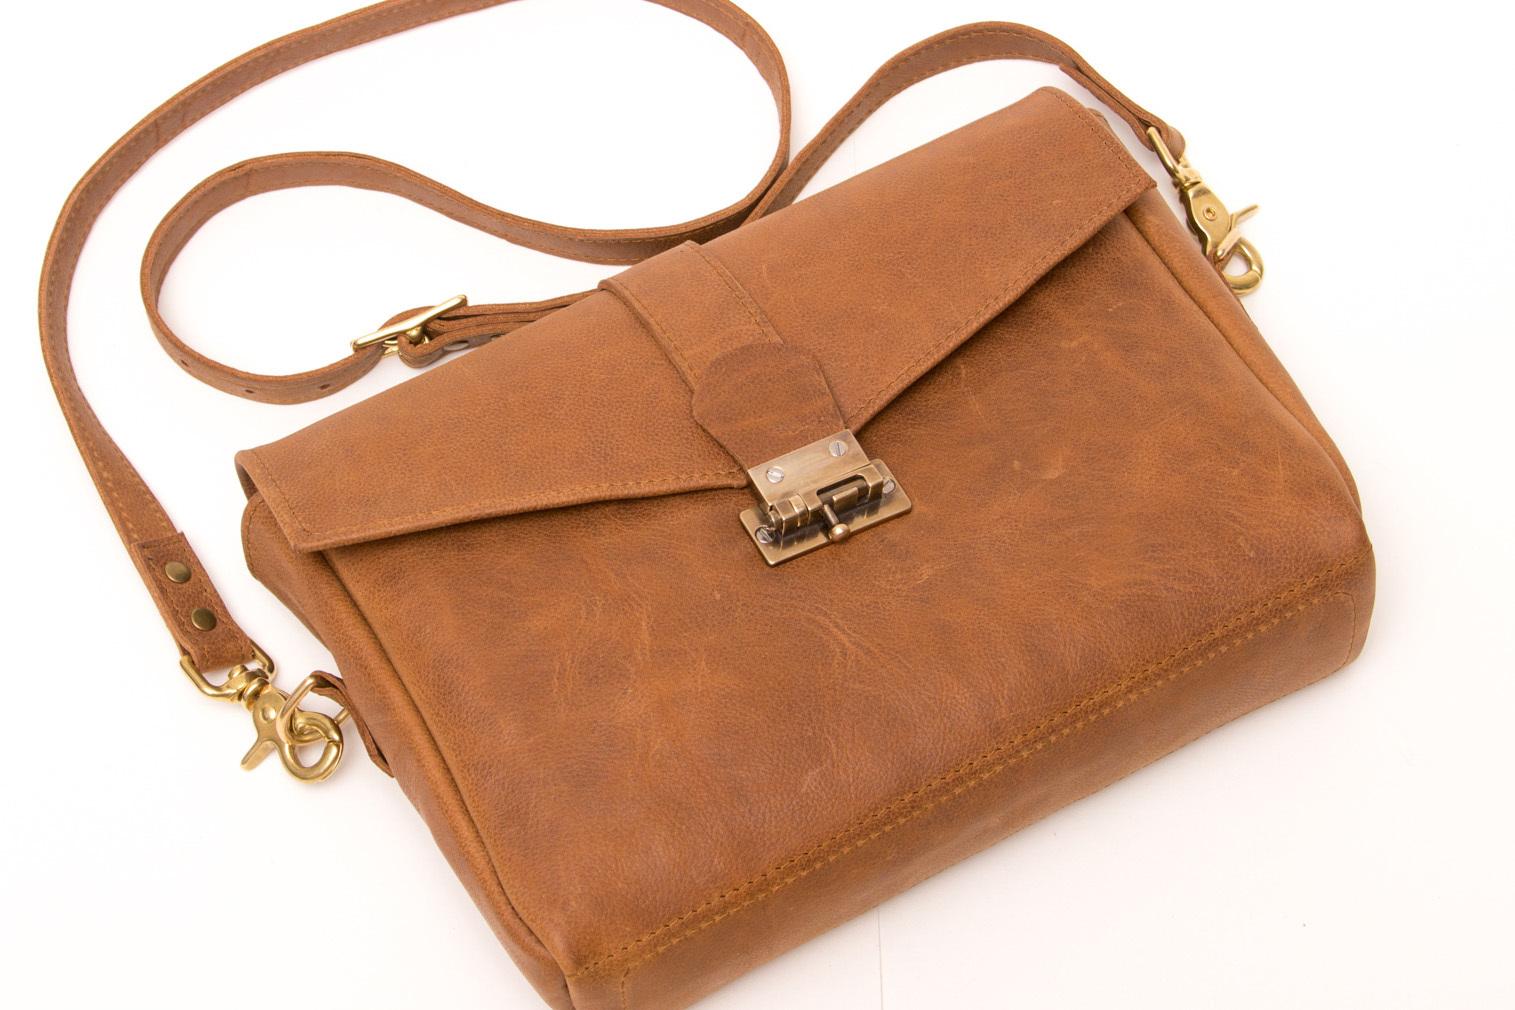 5aad4b9bc571 Кожаная сумка своими руками: kak_eto_sdelano